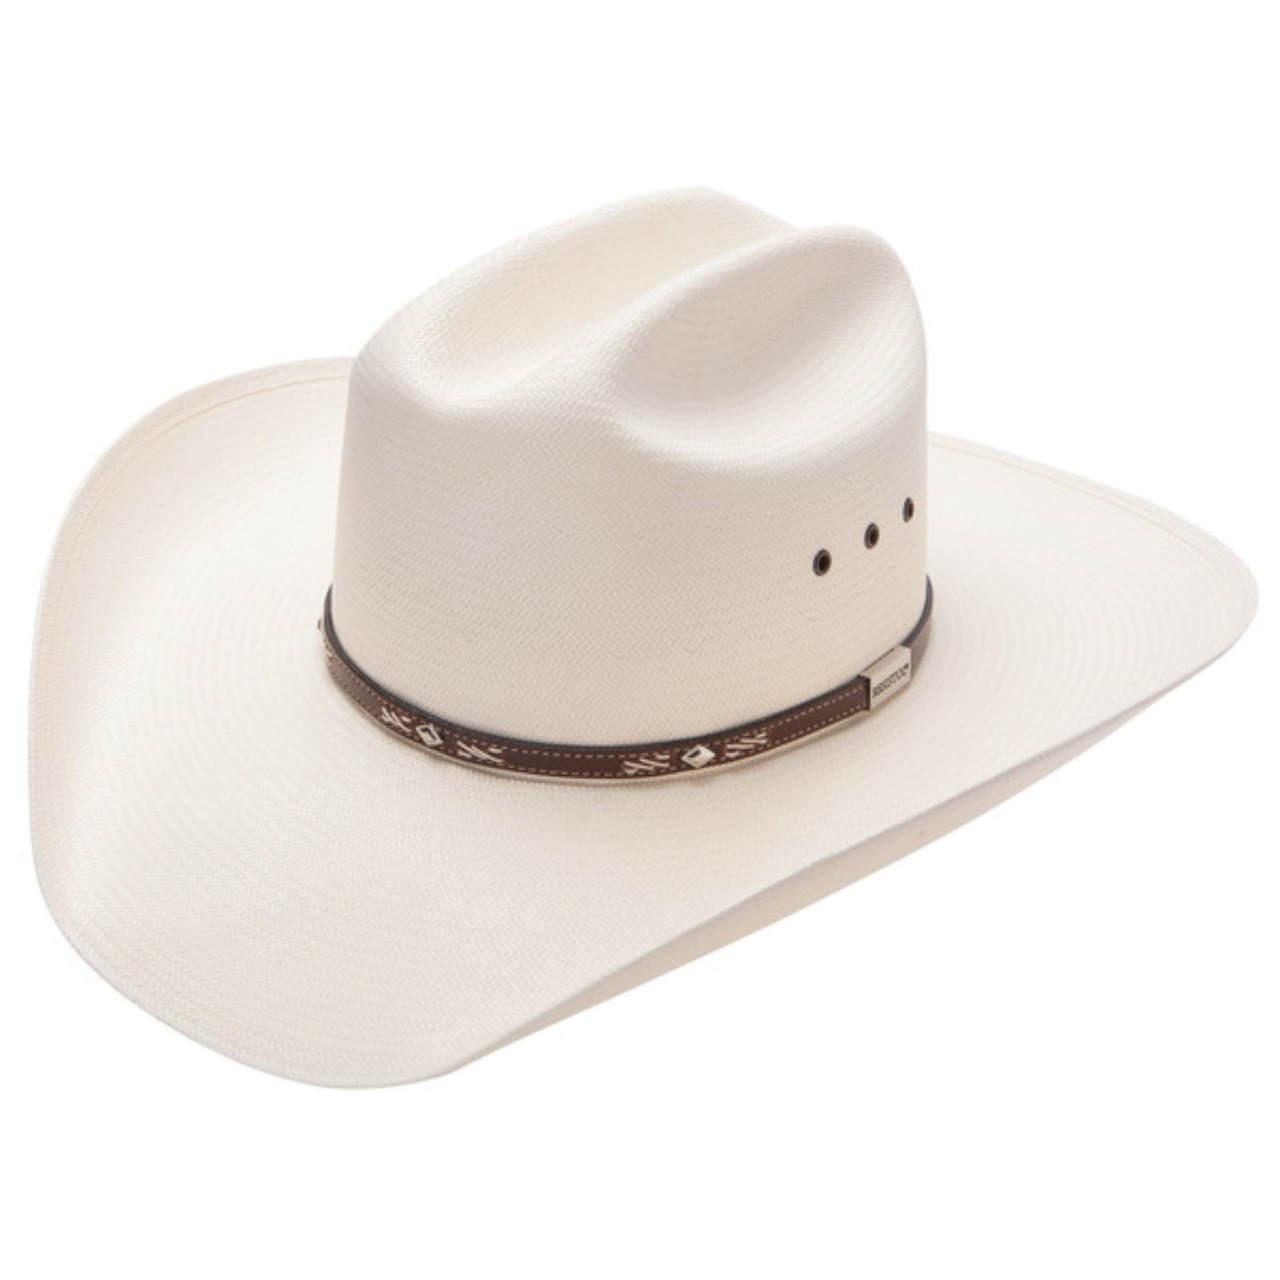 154588862707d George Strait Lambert 10X Straw Cowboy Hat - One 2 mini Ranch